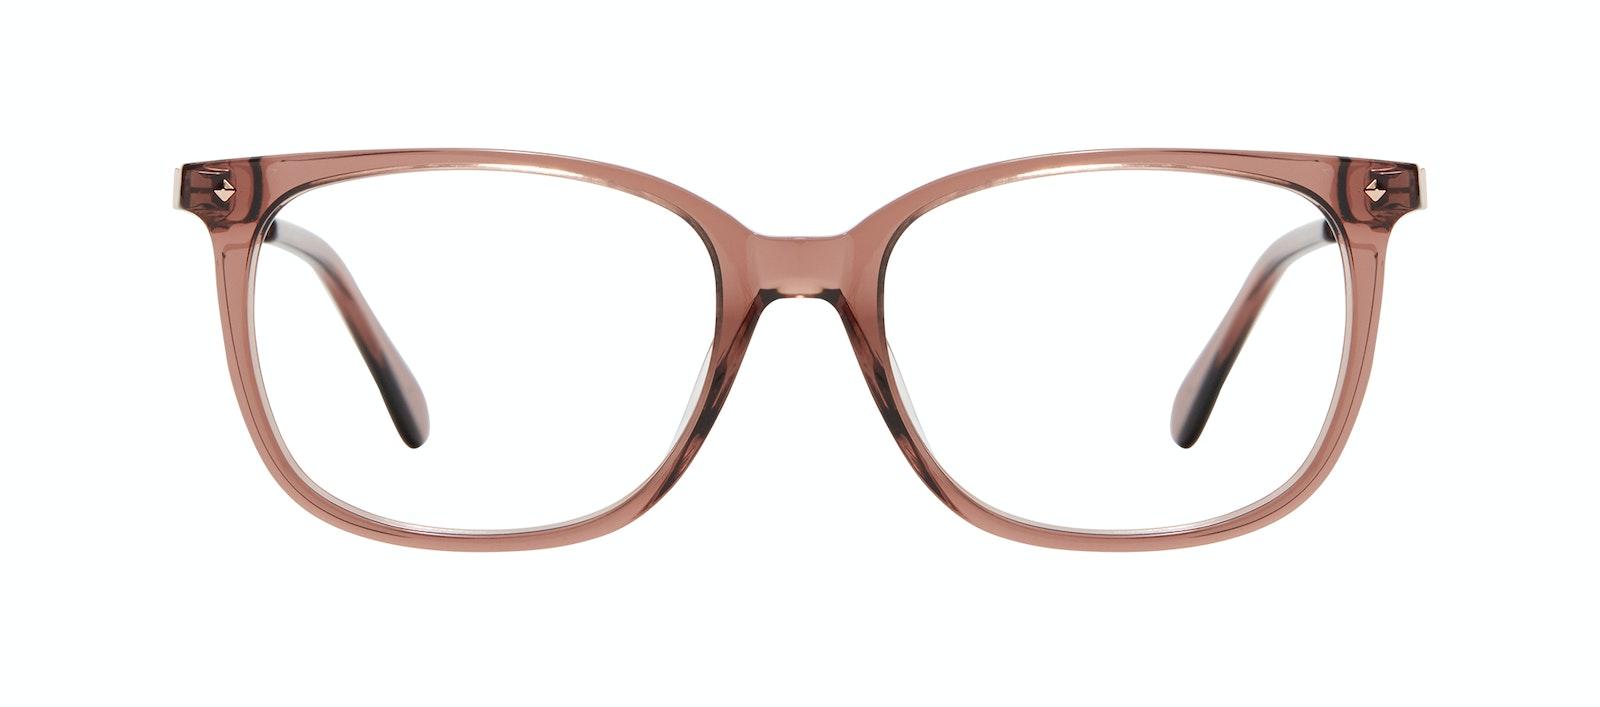 Affordable Fashion Glasses Rectangle Square Eyeglasses Women Refine Dark Terra Front